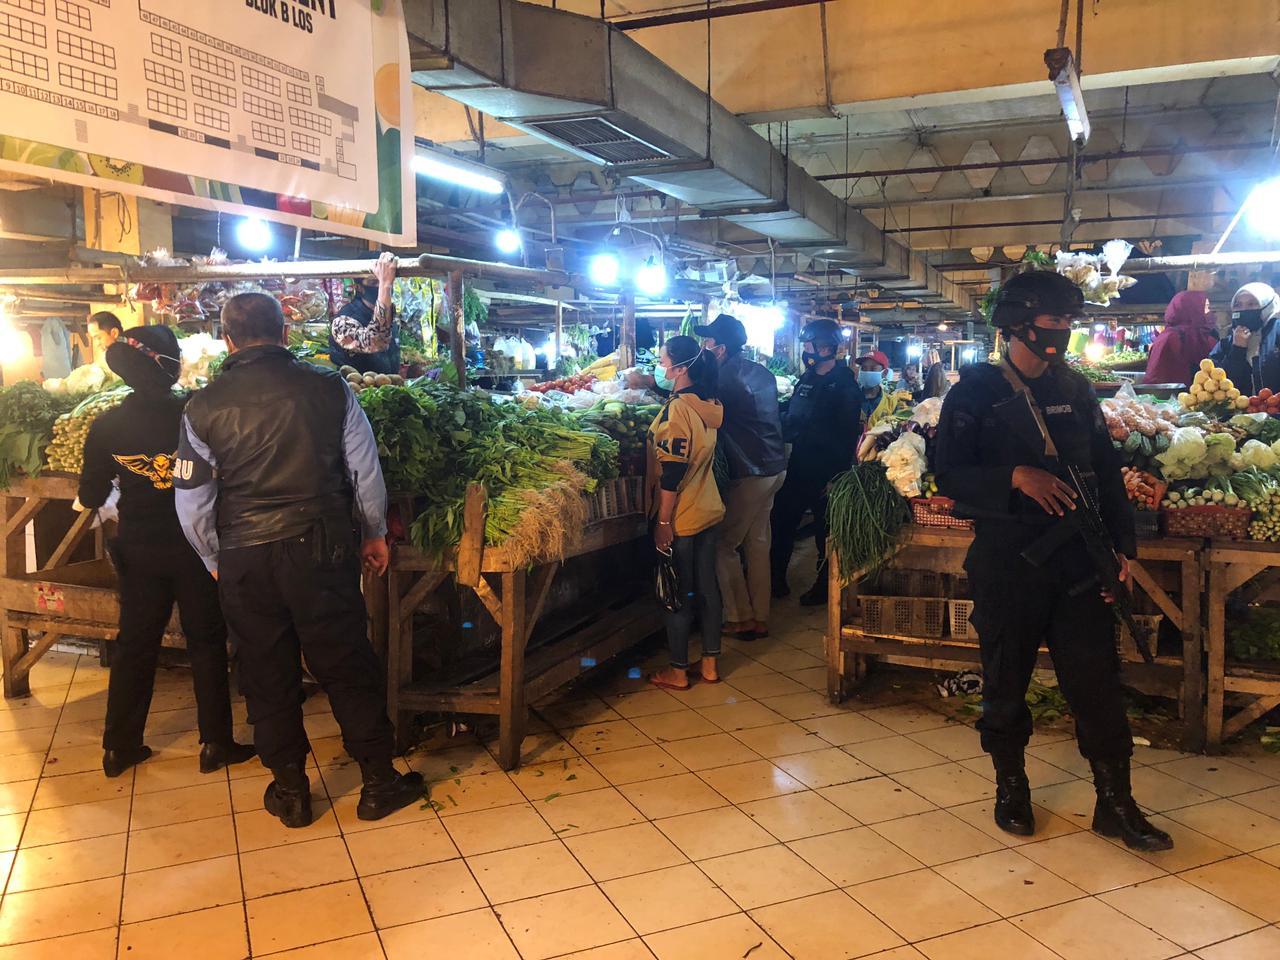 Sat Brimob Polda Jabar Lakukan Inspeksi Mendadak ke Pedagang Pasar Cipanas